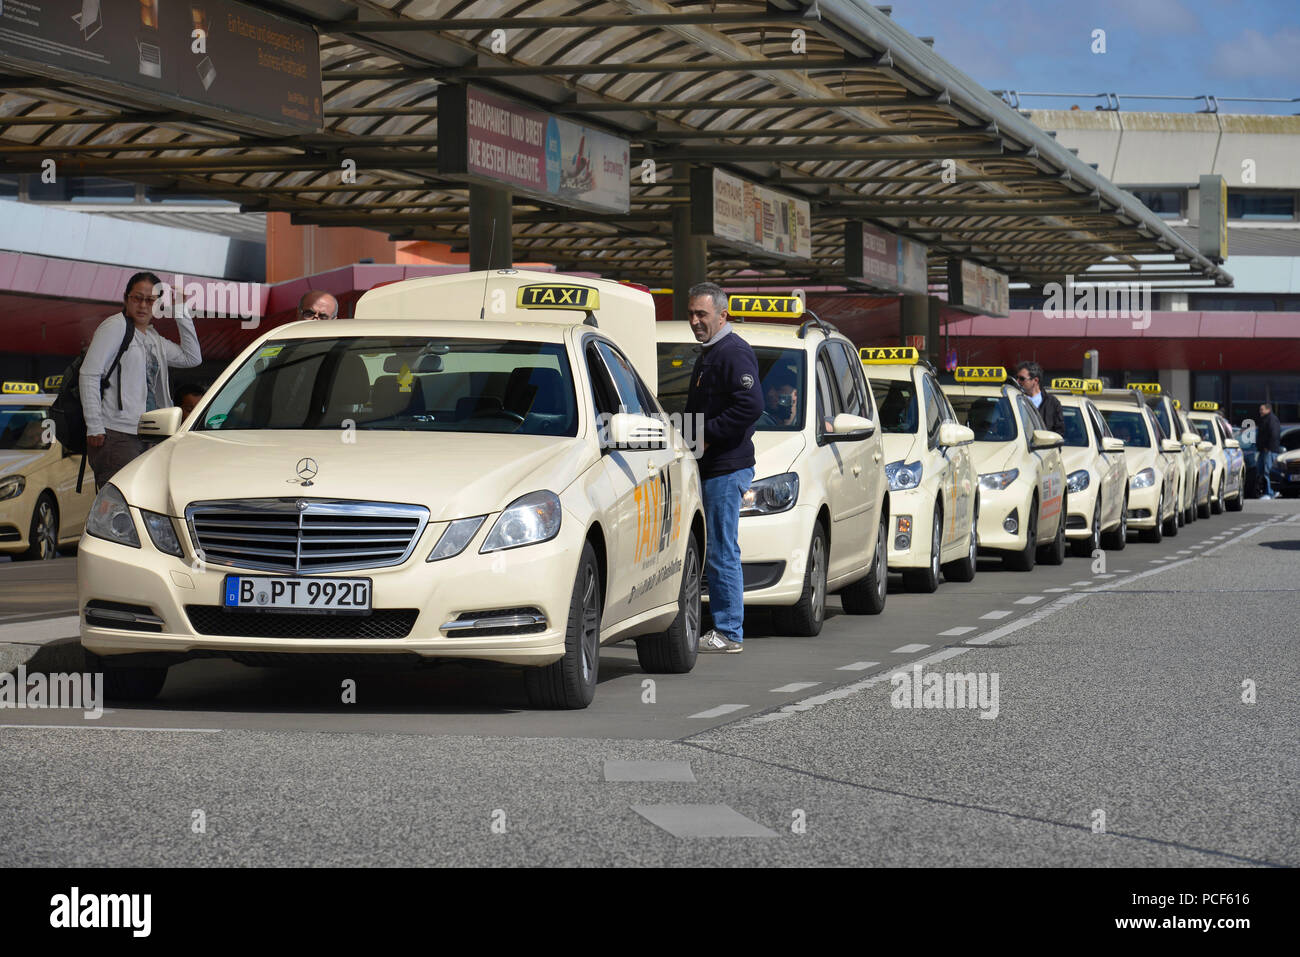 Taxis, Terminal A, Flughafen Tegel, Reinickendorf, Berlin, Deutschland - Stock Image